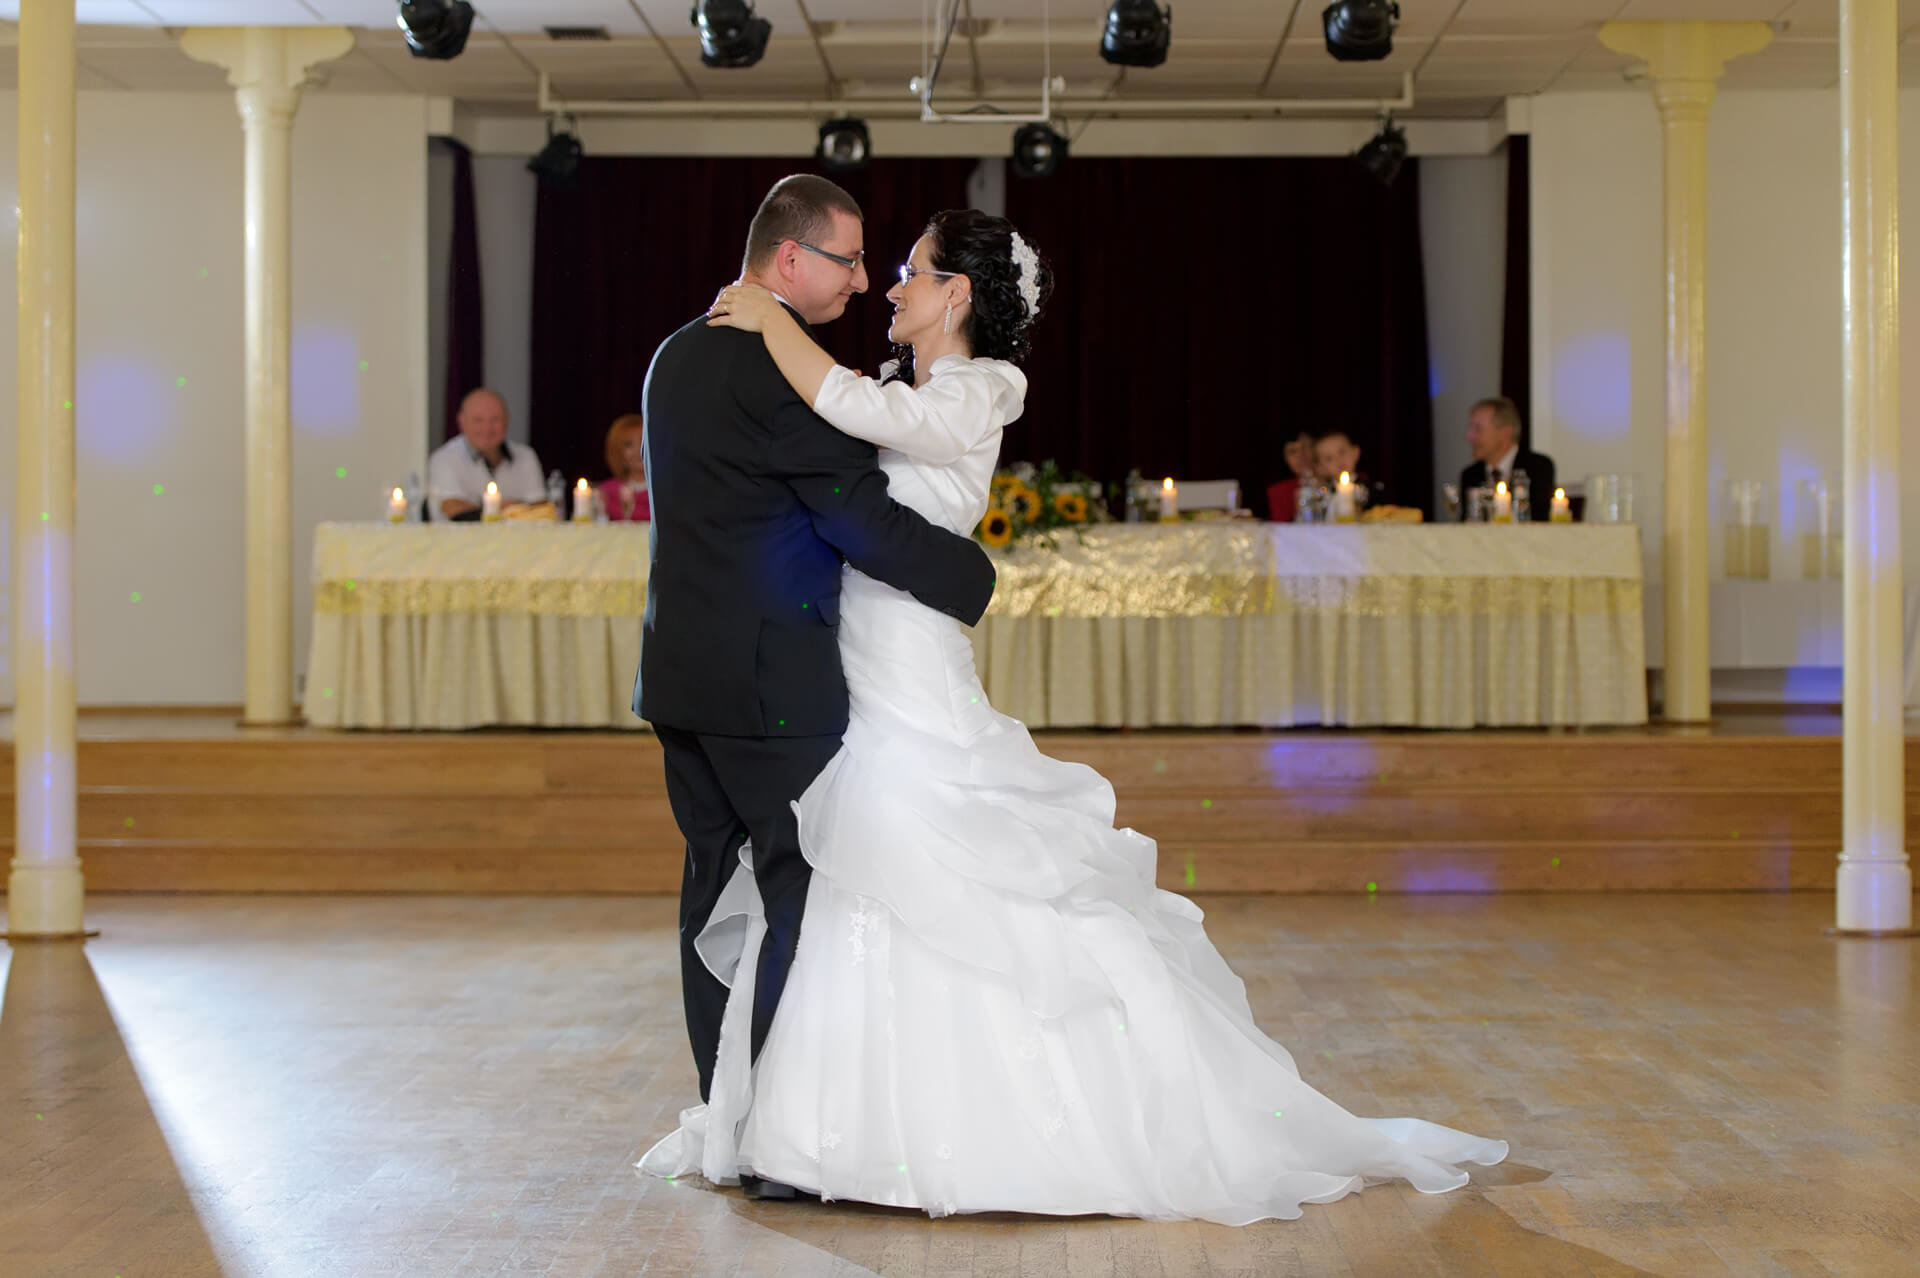 svadba svadobny zabava prvomanzelsky tanec hostina profesionalne fotenie fotograf Peter Norulak Kosice__01